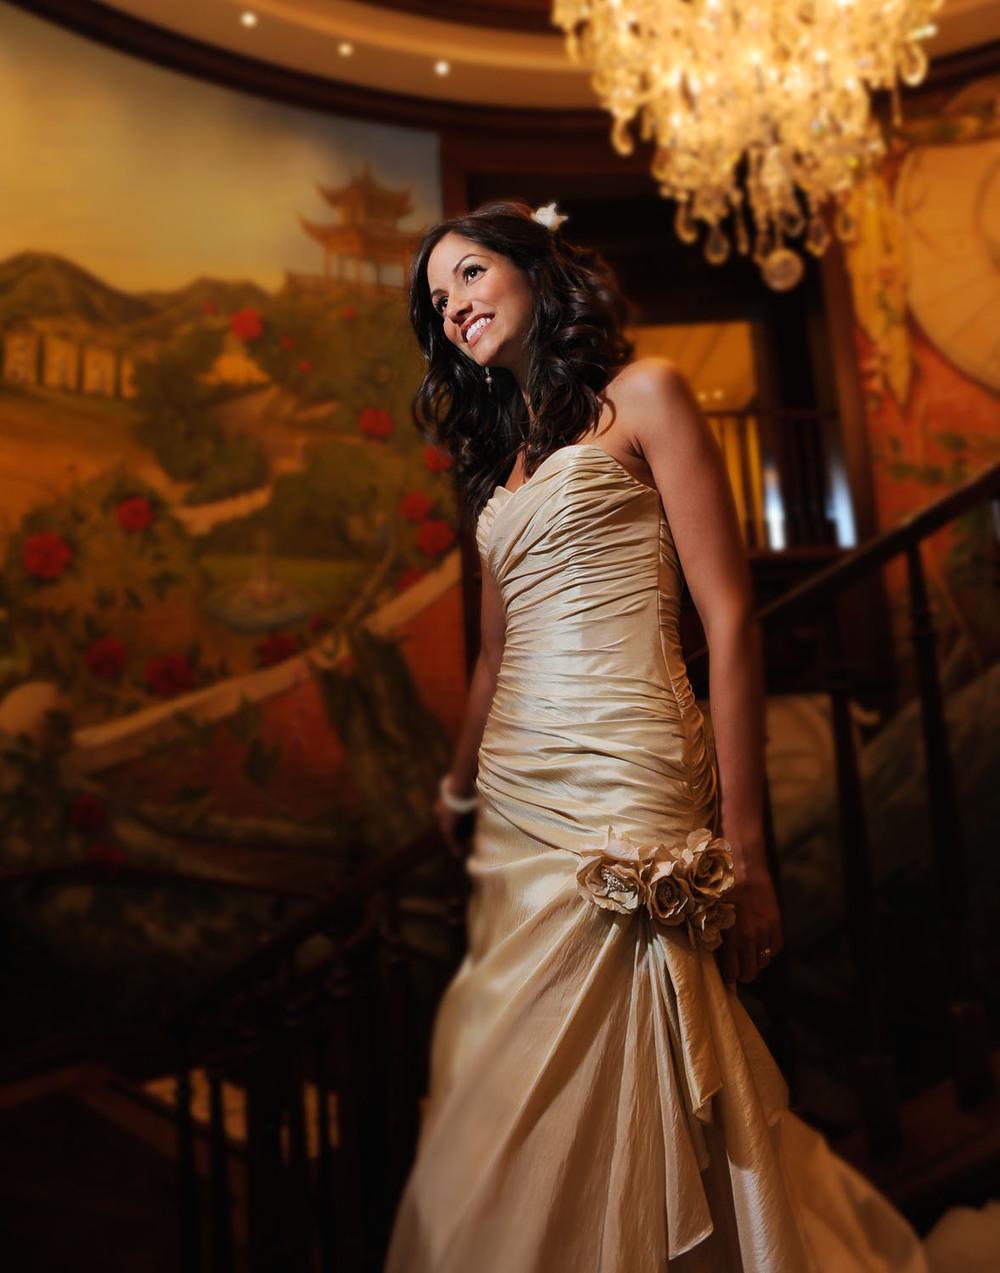 stewart_bertrand_weddings_whp1-1004.jpg